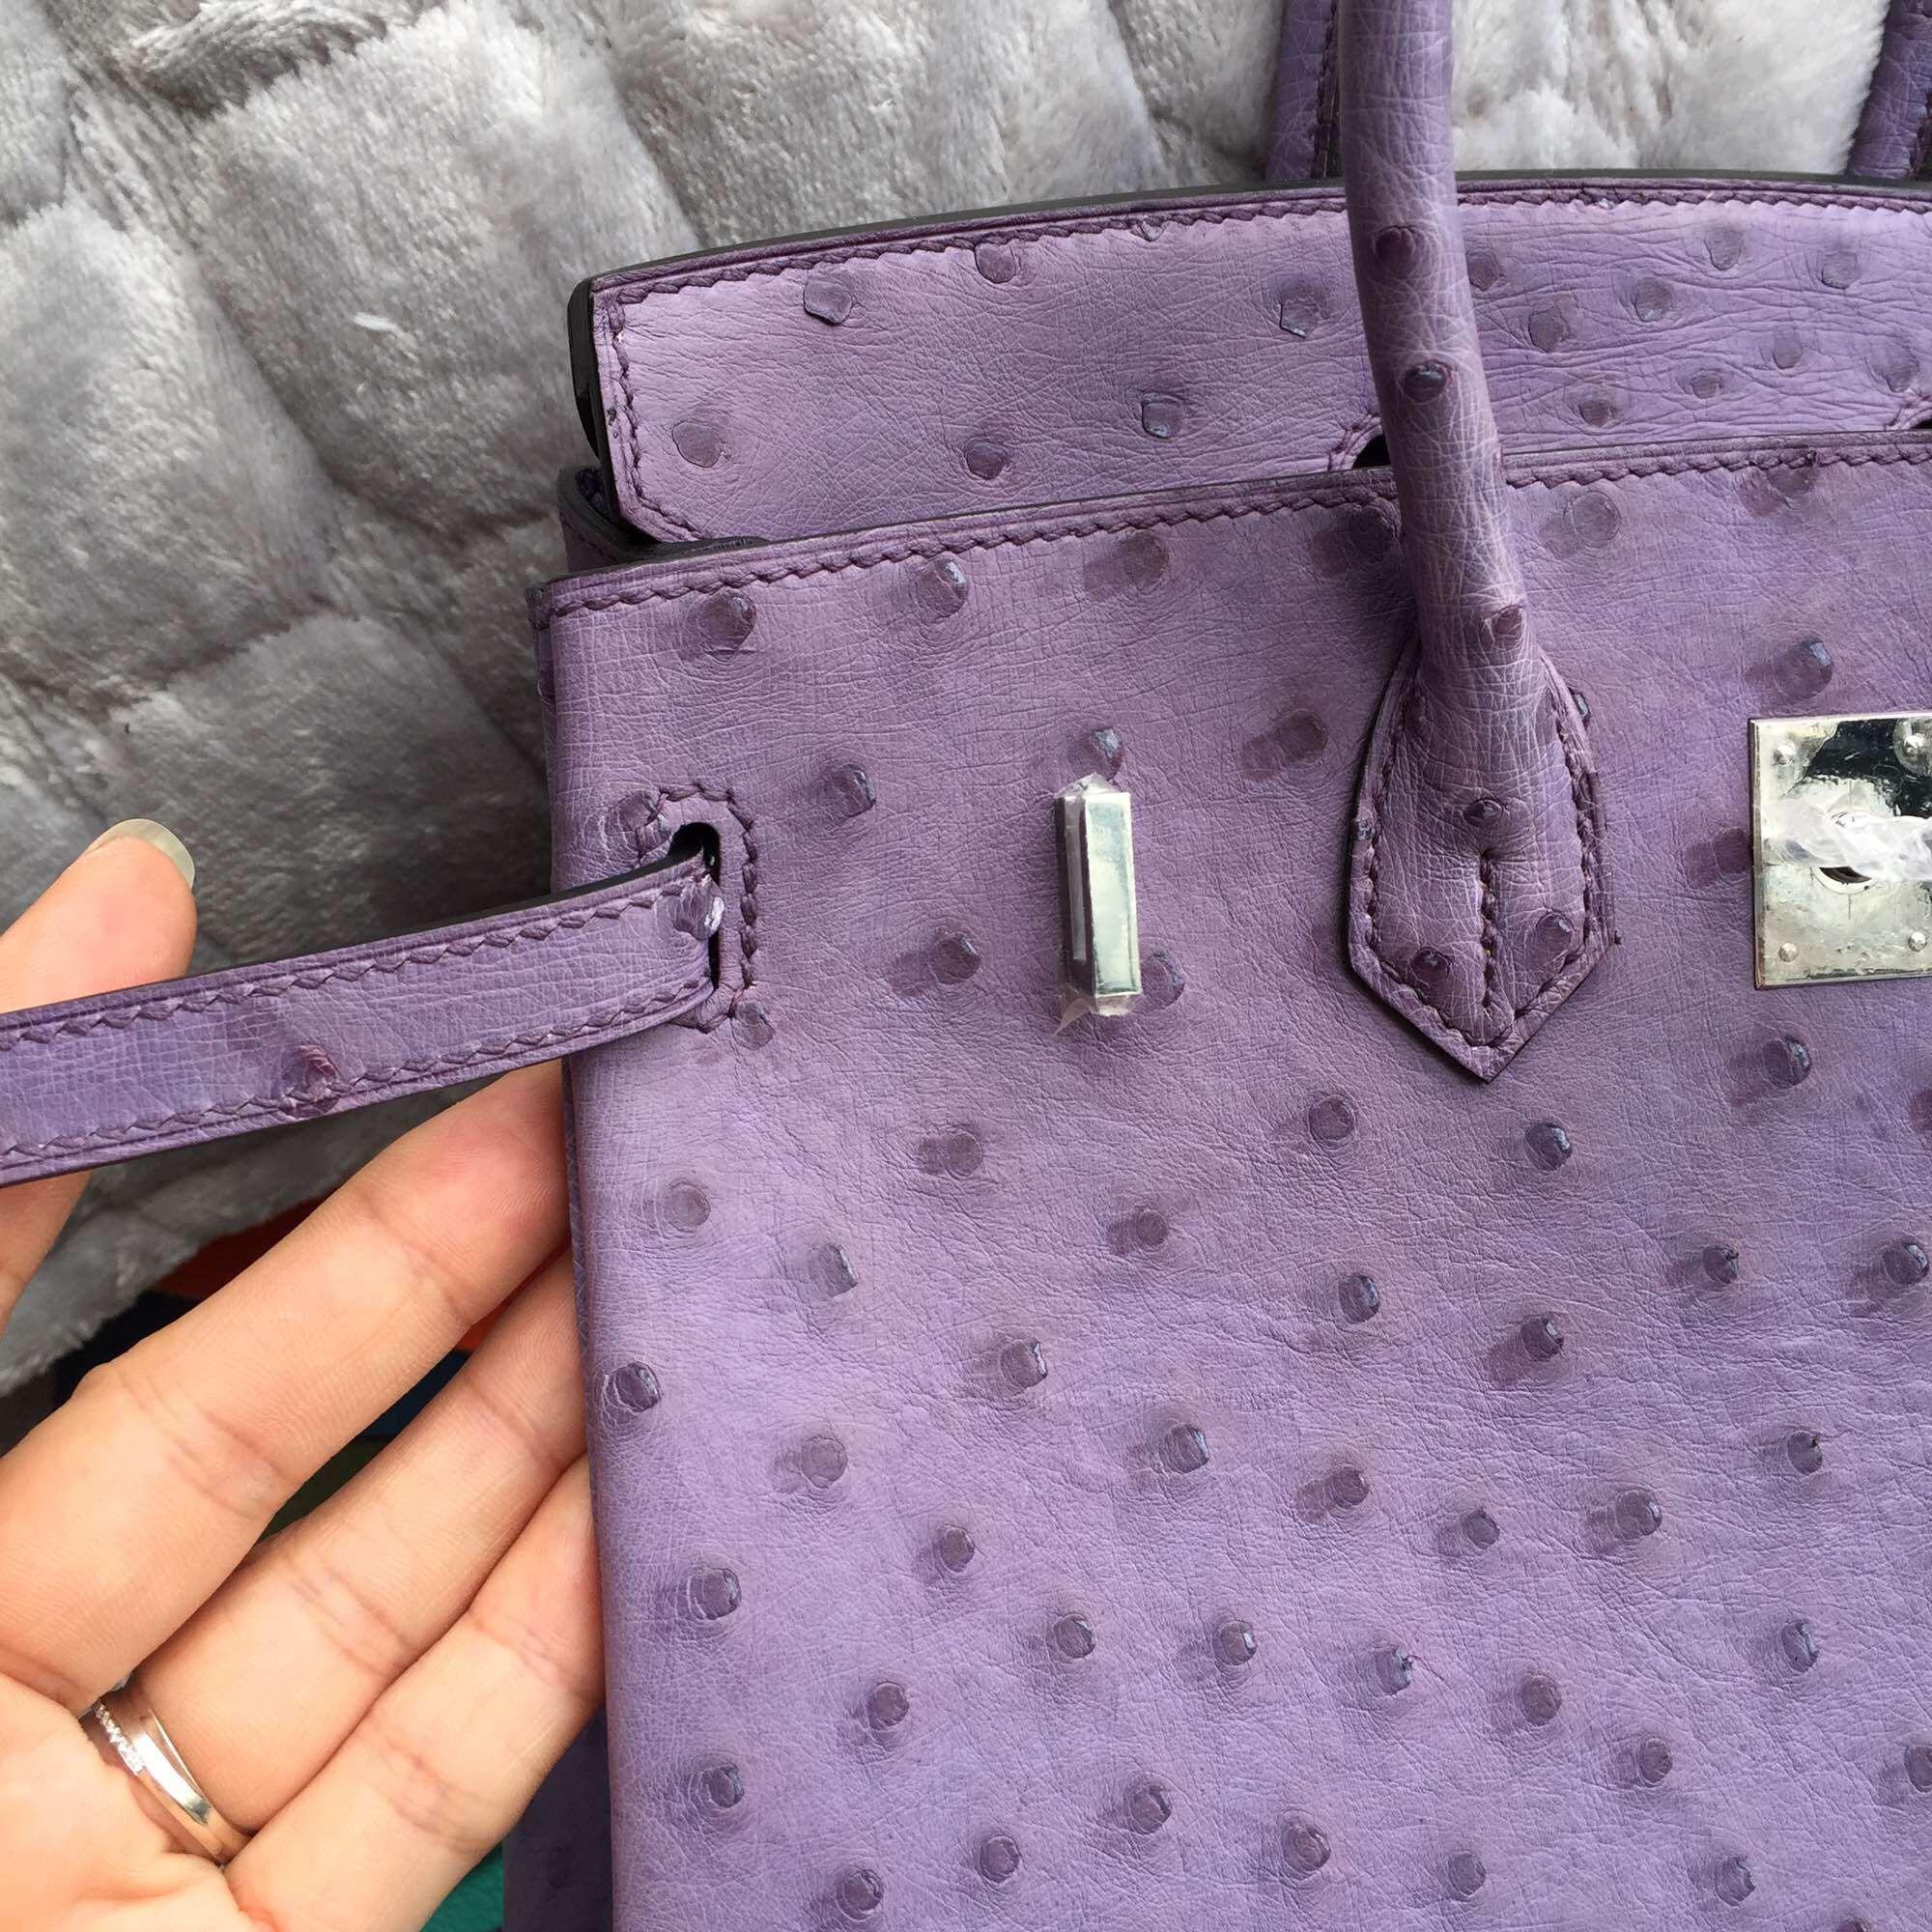 Discount 25CM Hermes Birkin Bag in Light Purple Ostrich Leather Silver Hardware